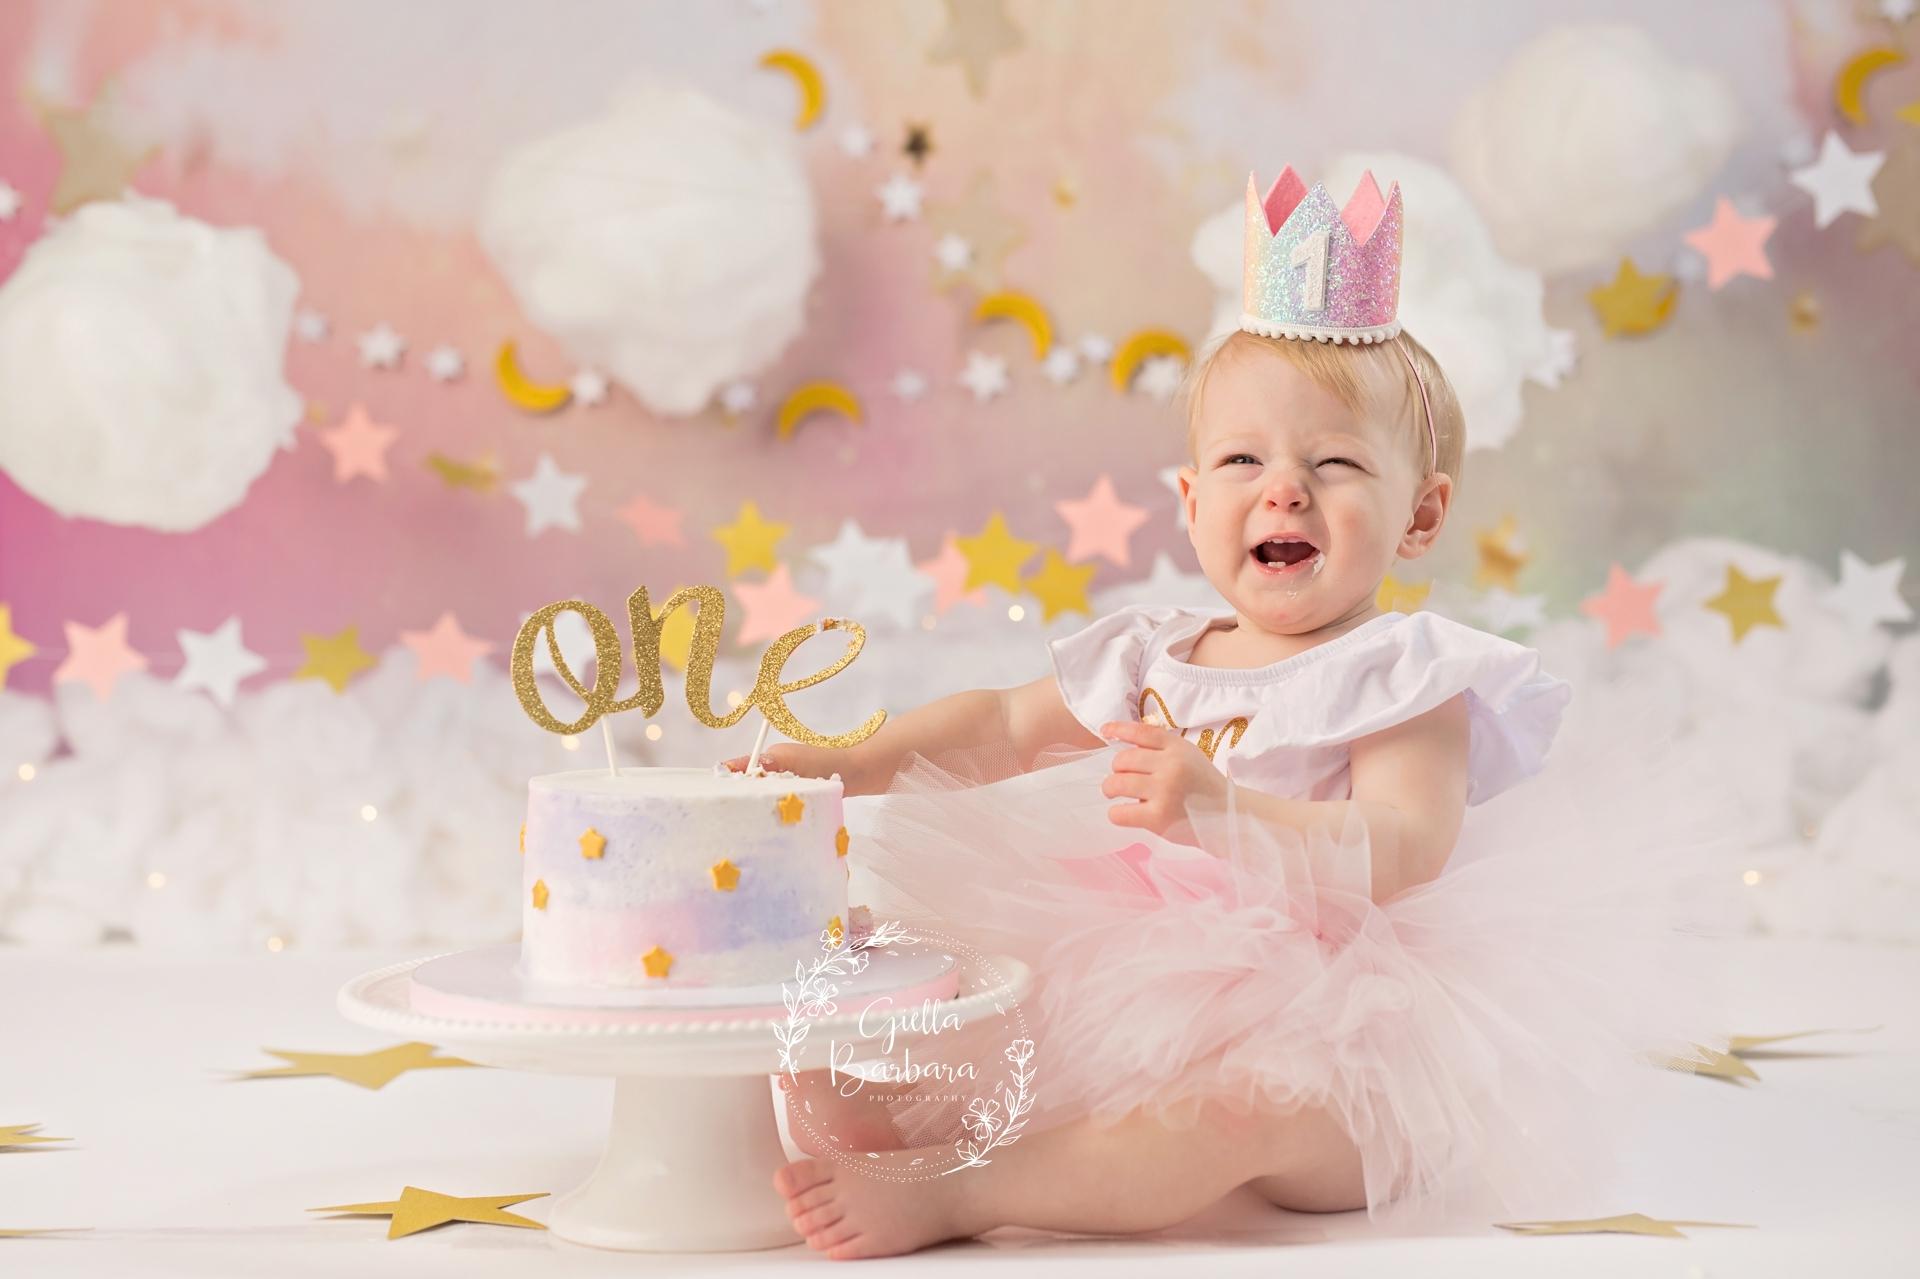 baby in pink tutu